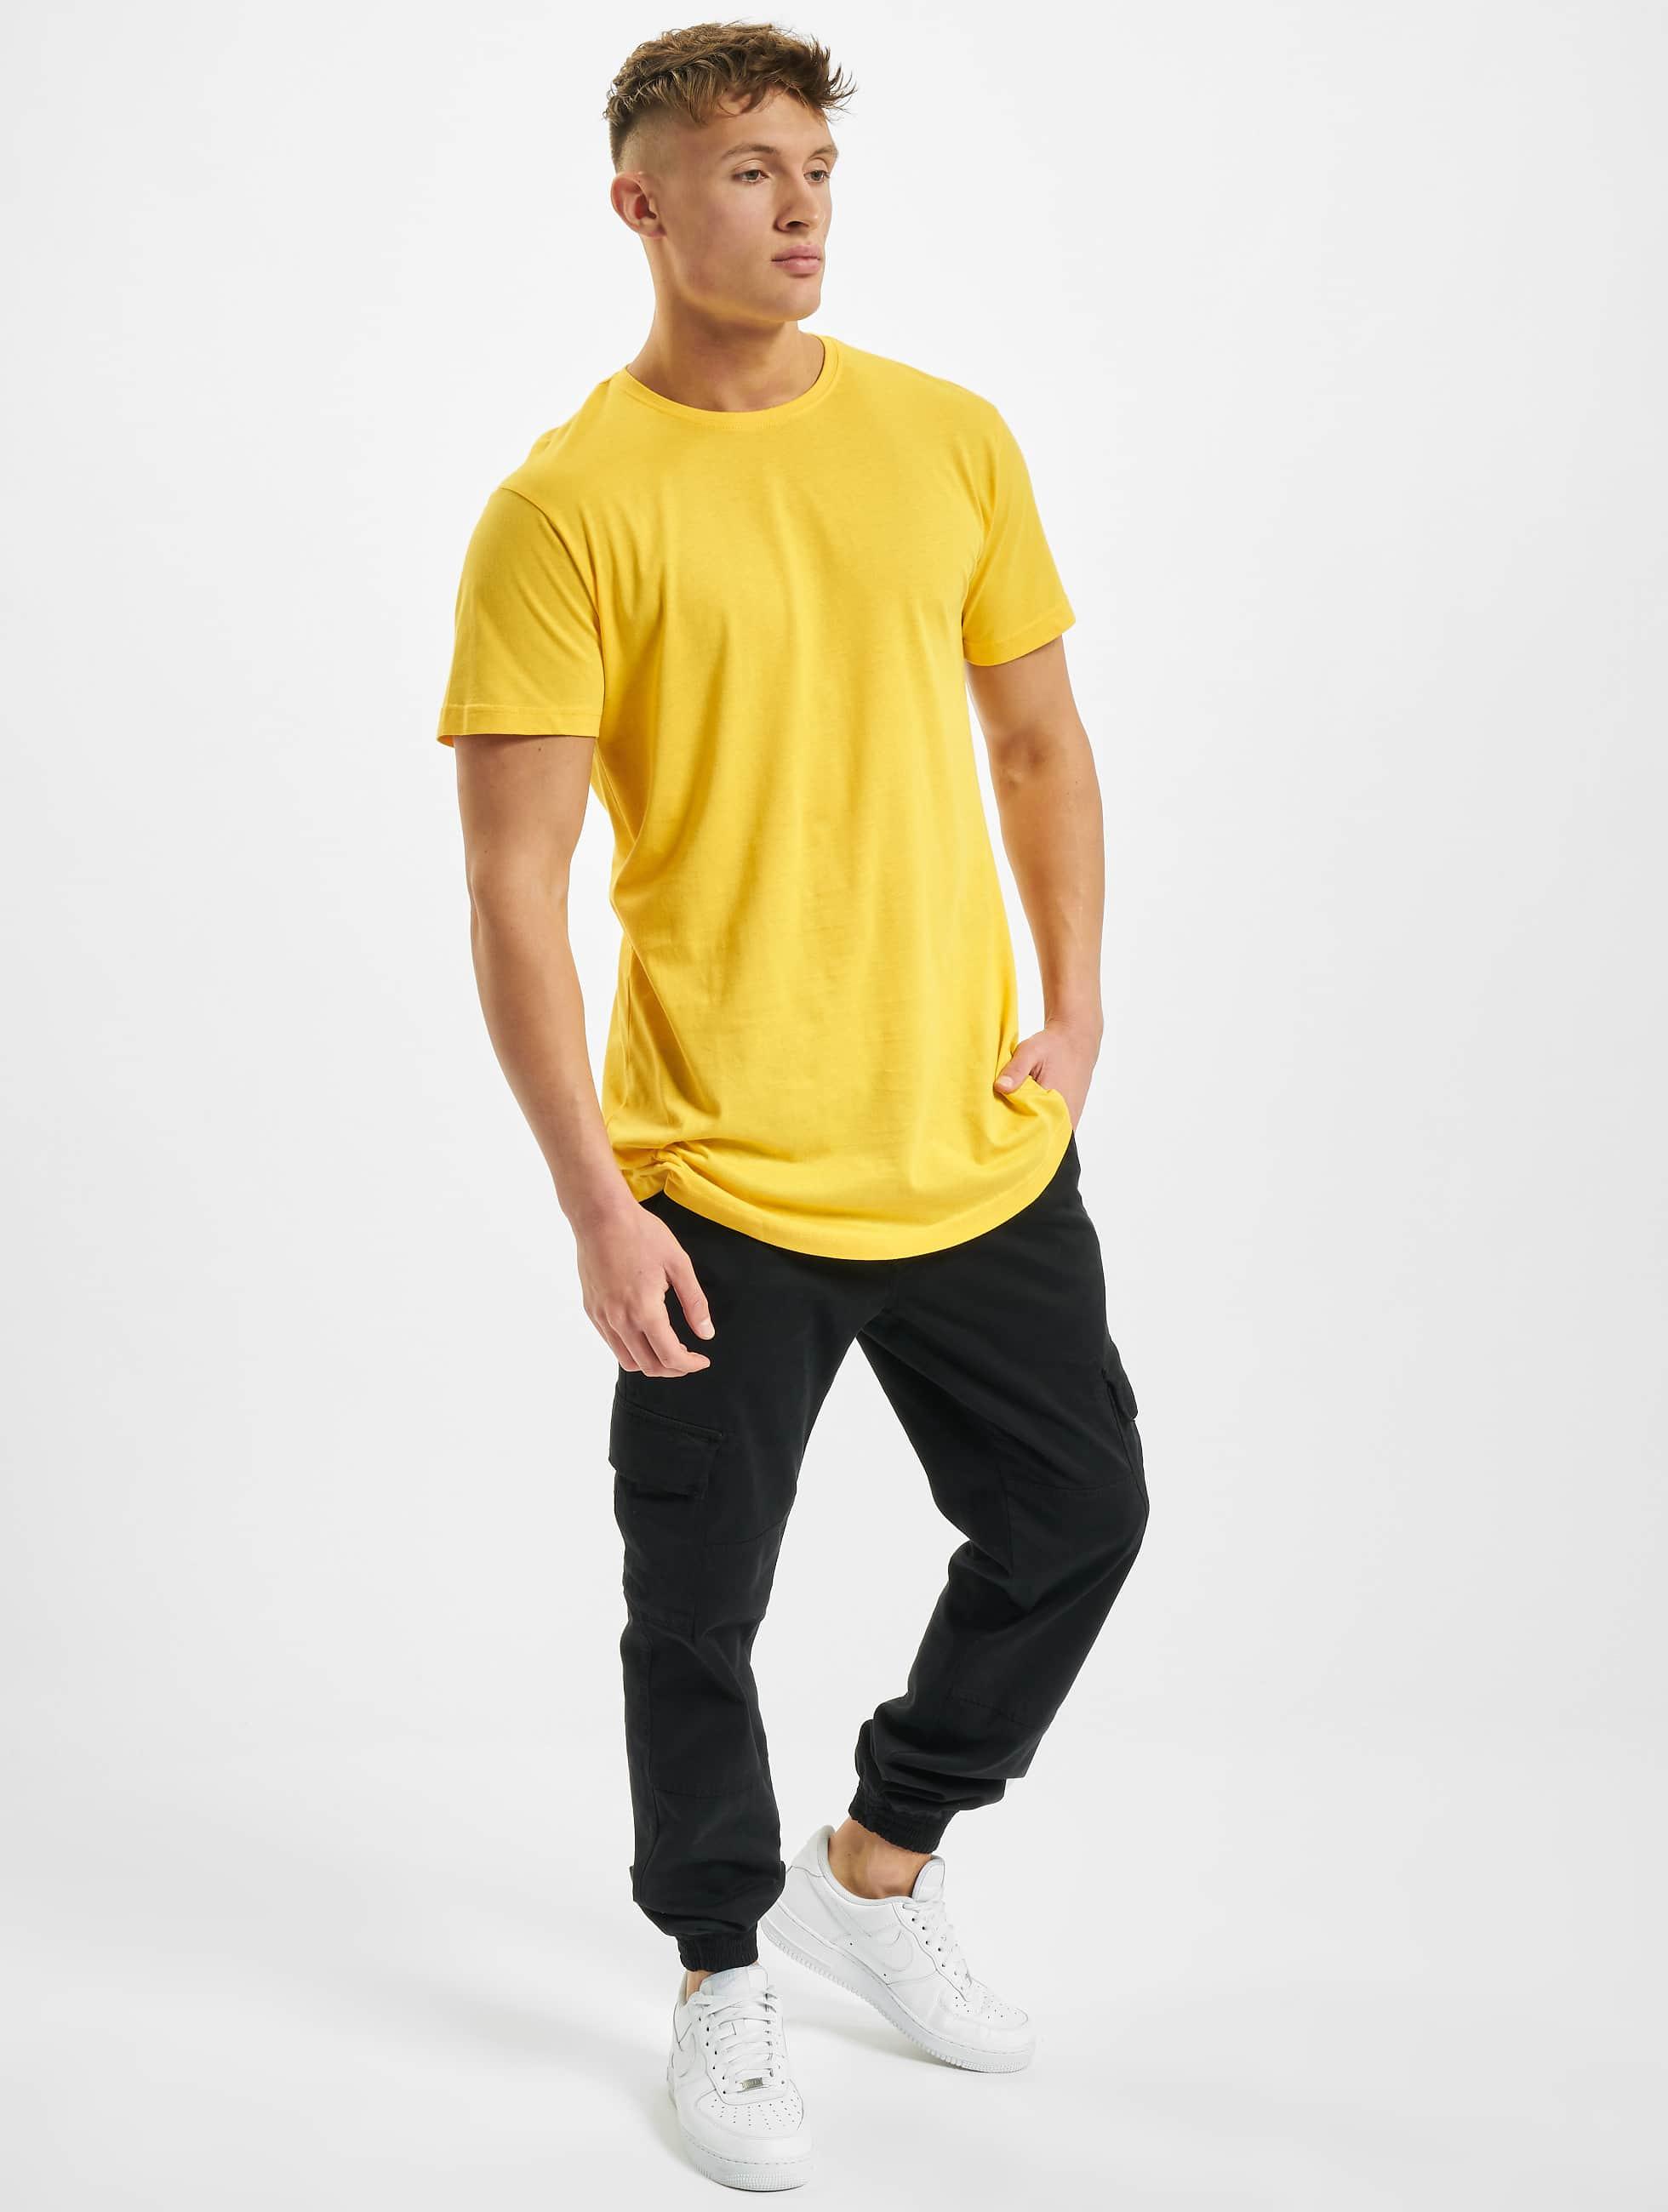 Urban Classics T-shirt Shaped Oversized Long giallo